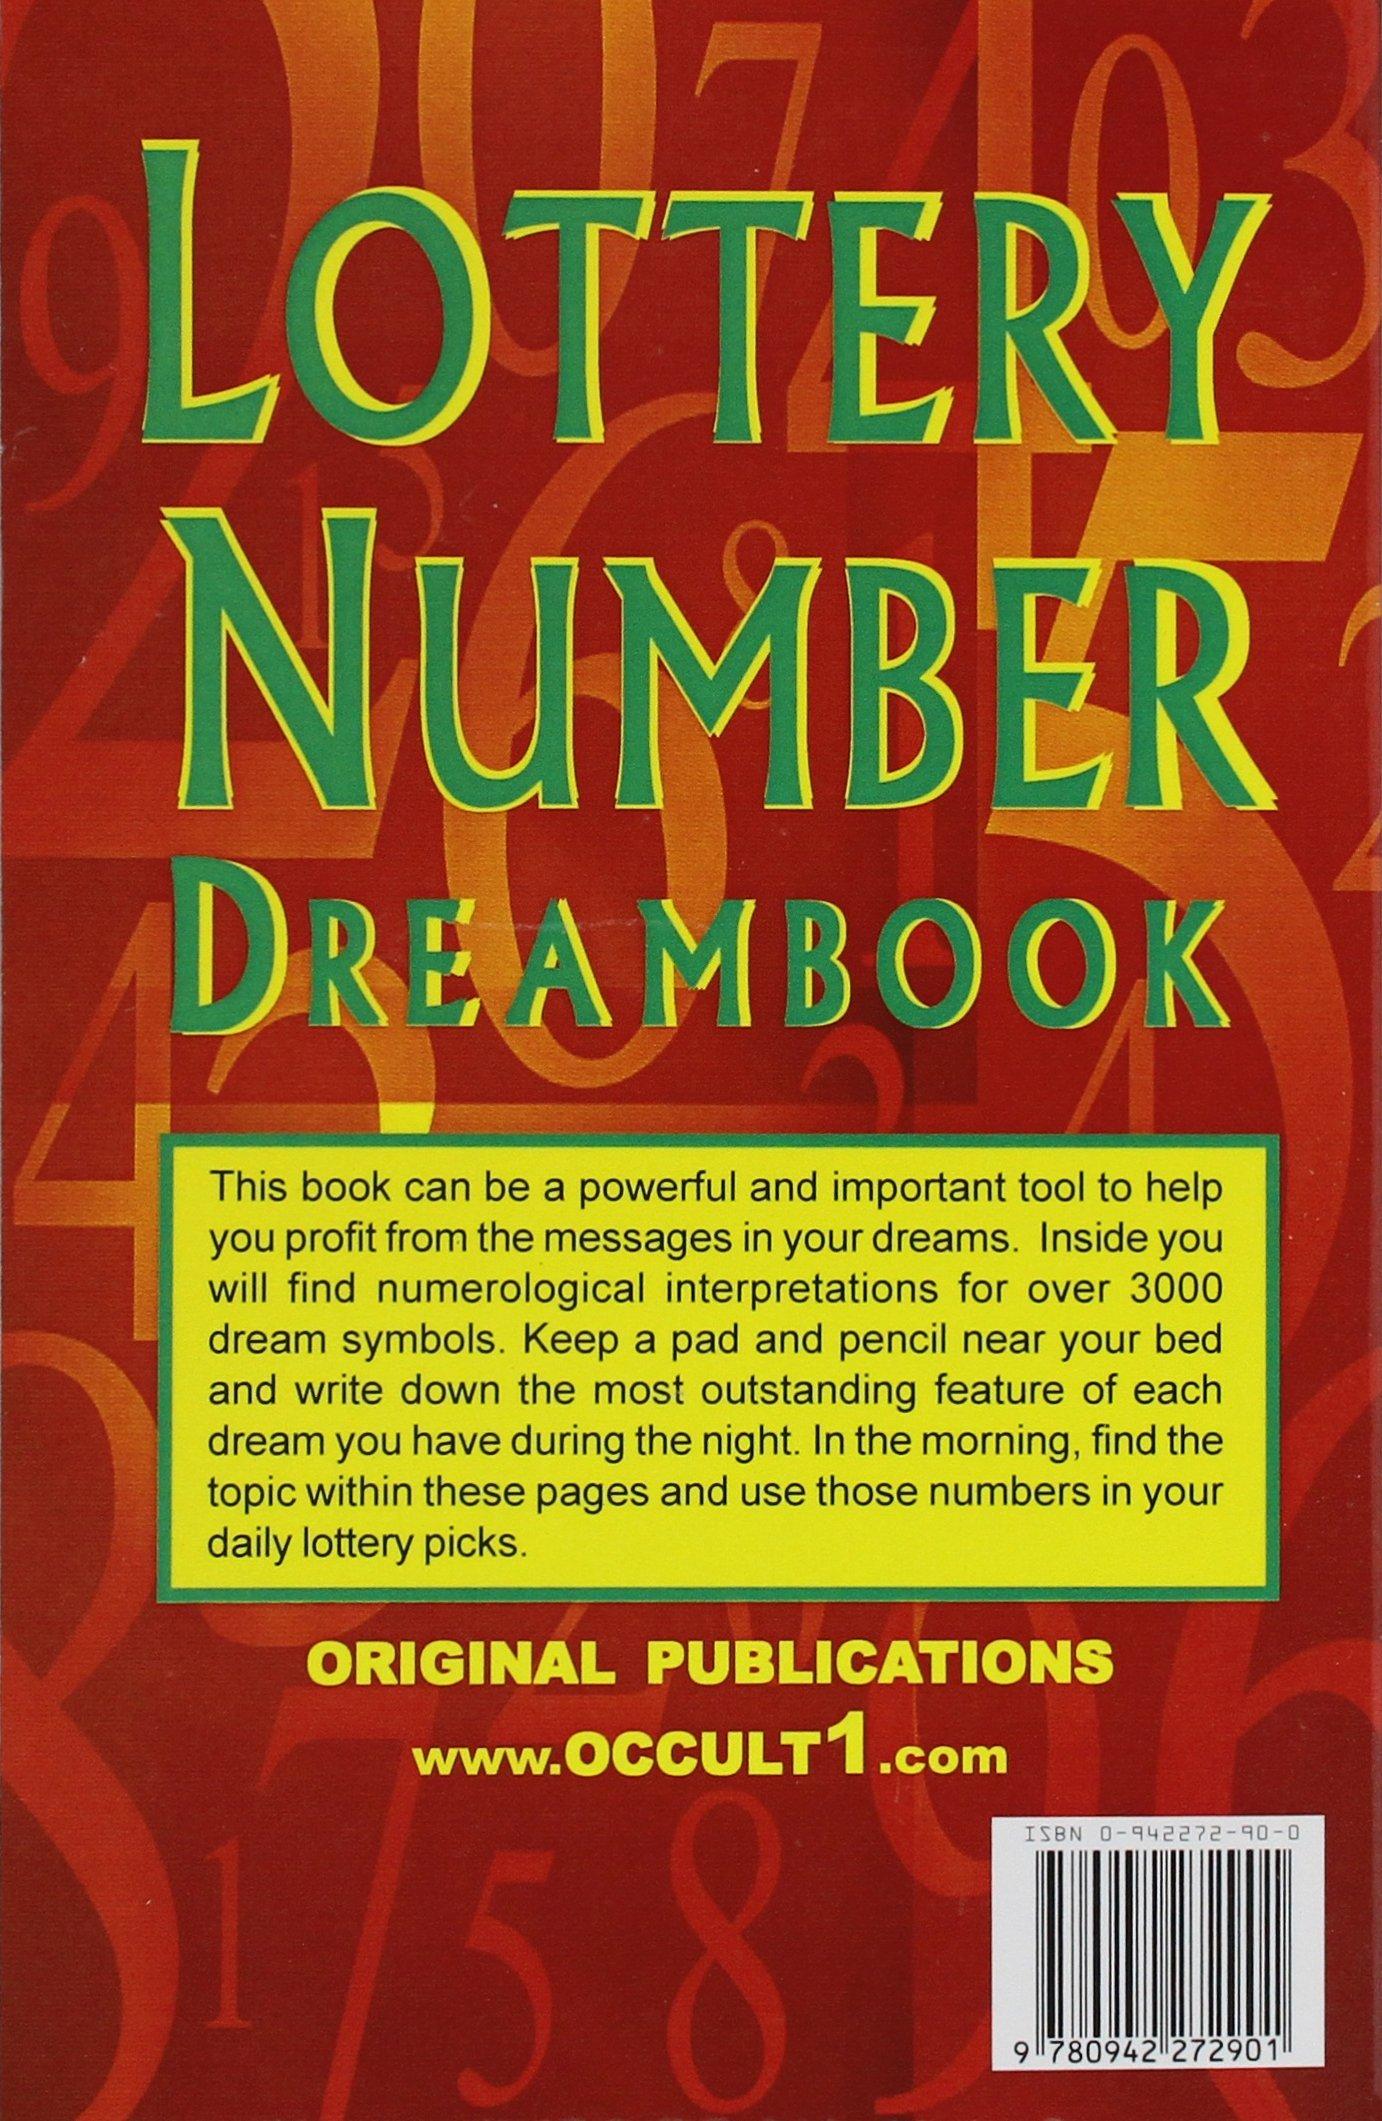 Lottery Number Dream Book: Original Publications / Occult1